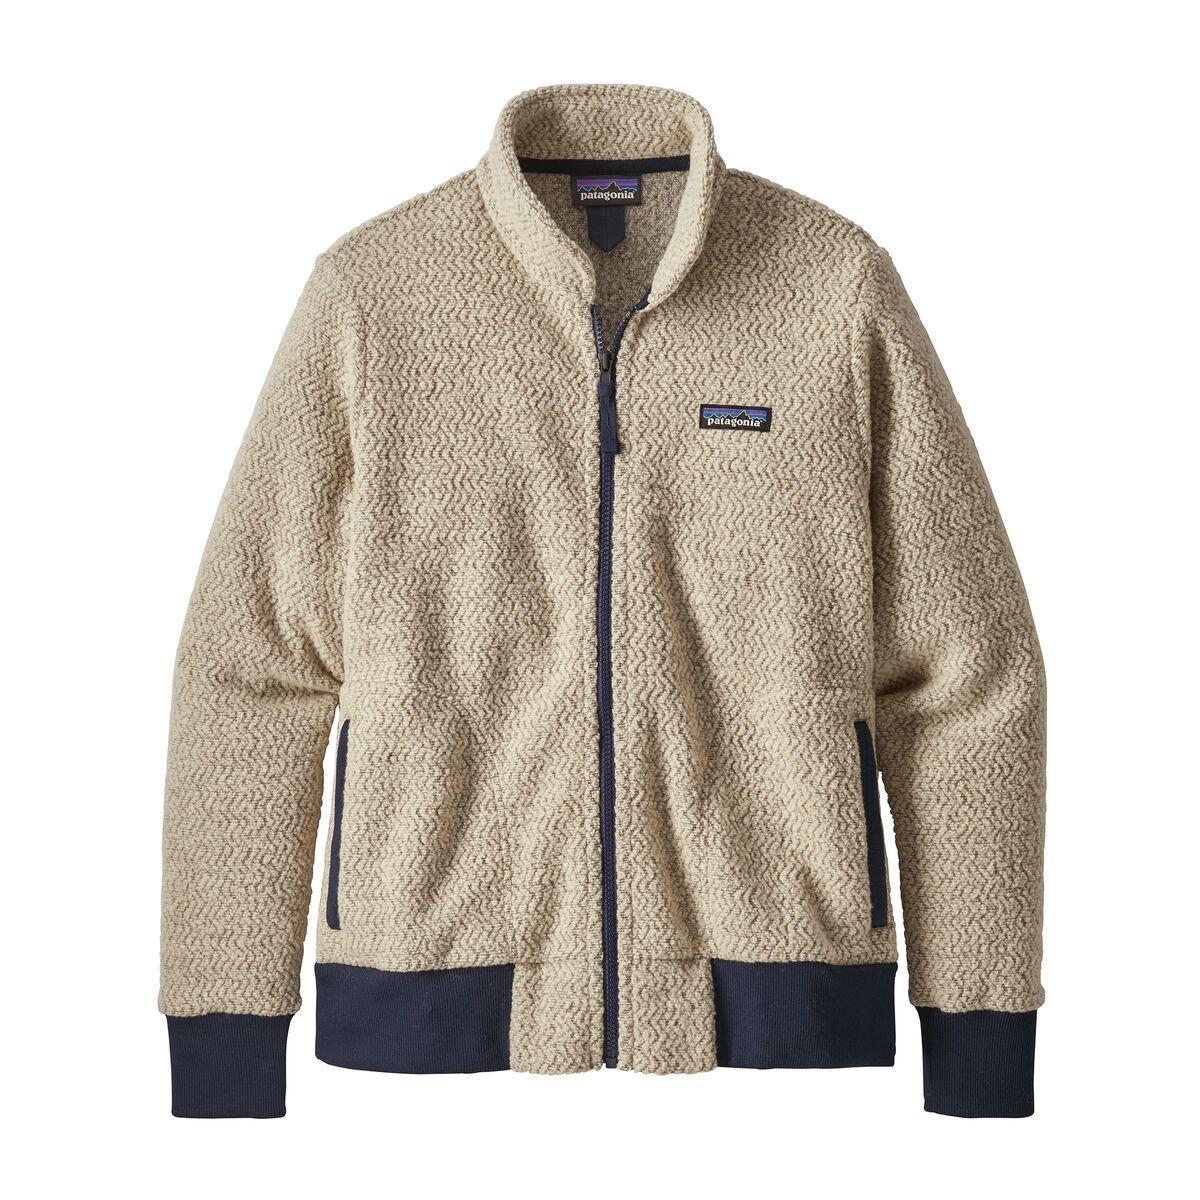 Women's Woolyester Fleece Jacket #projekteimfreien